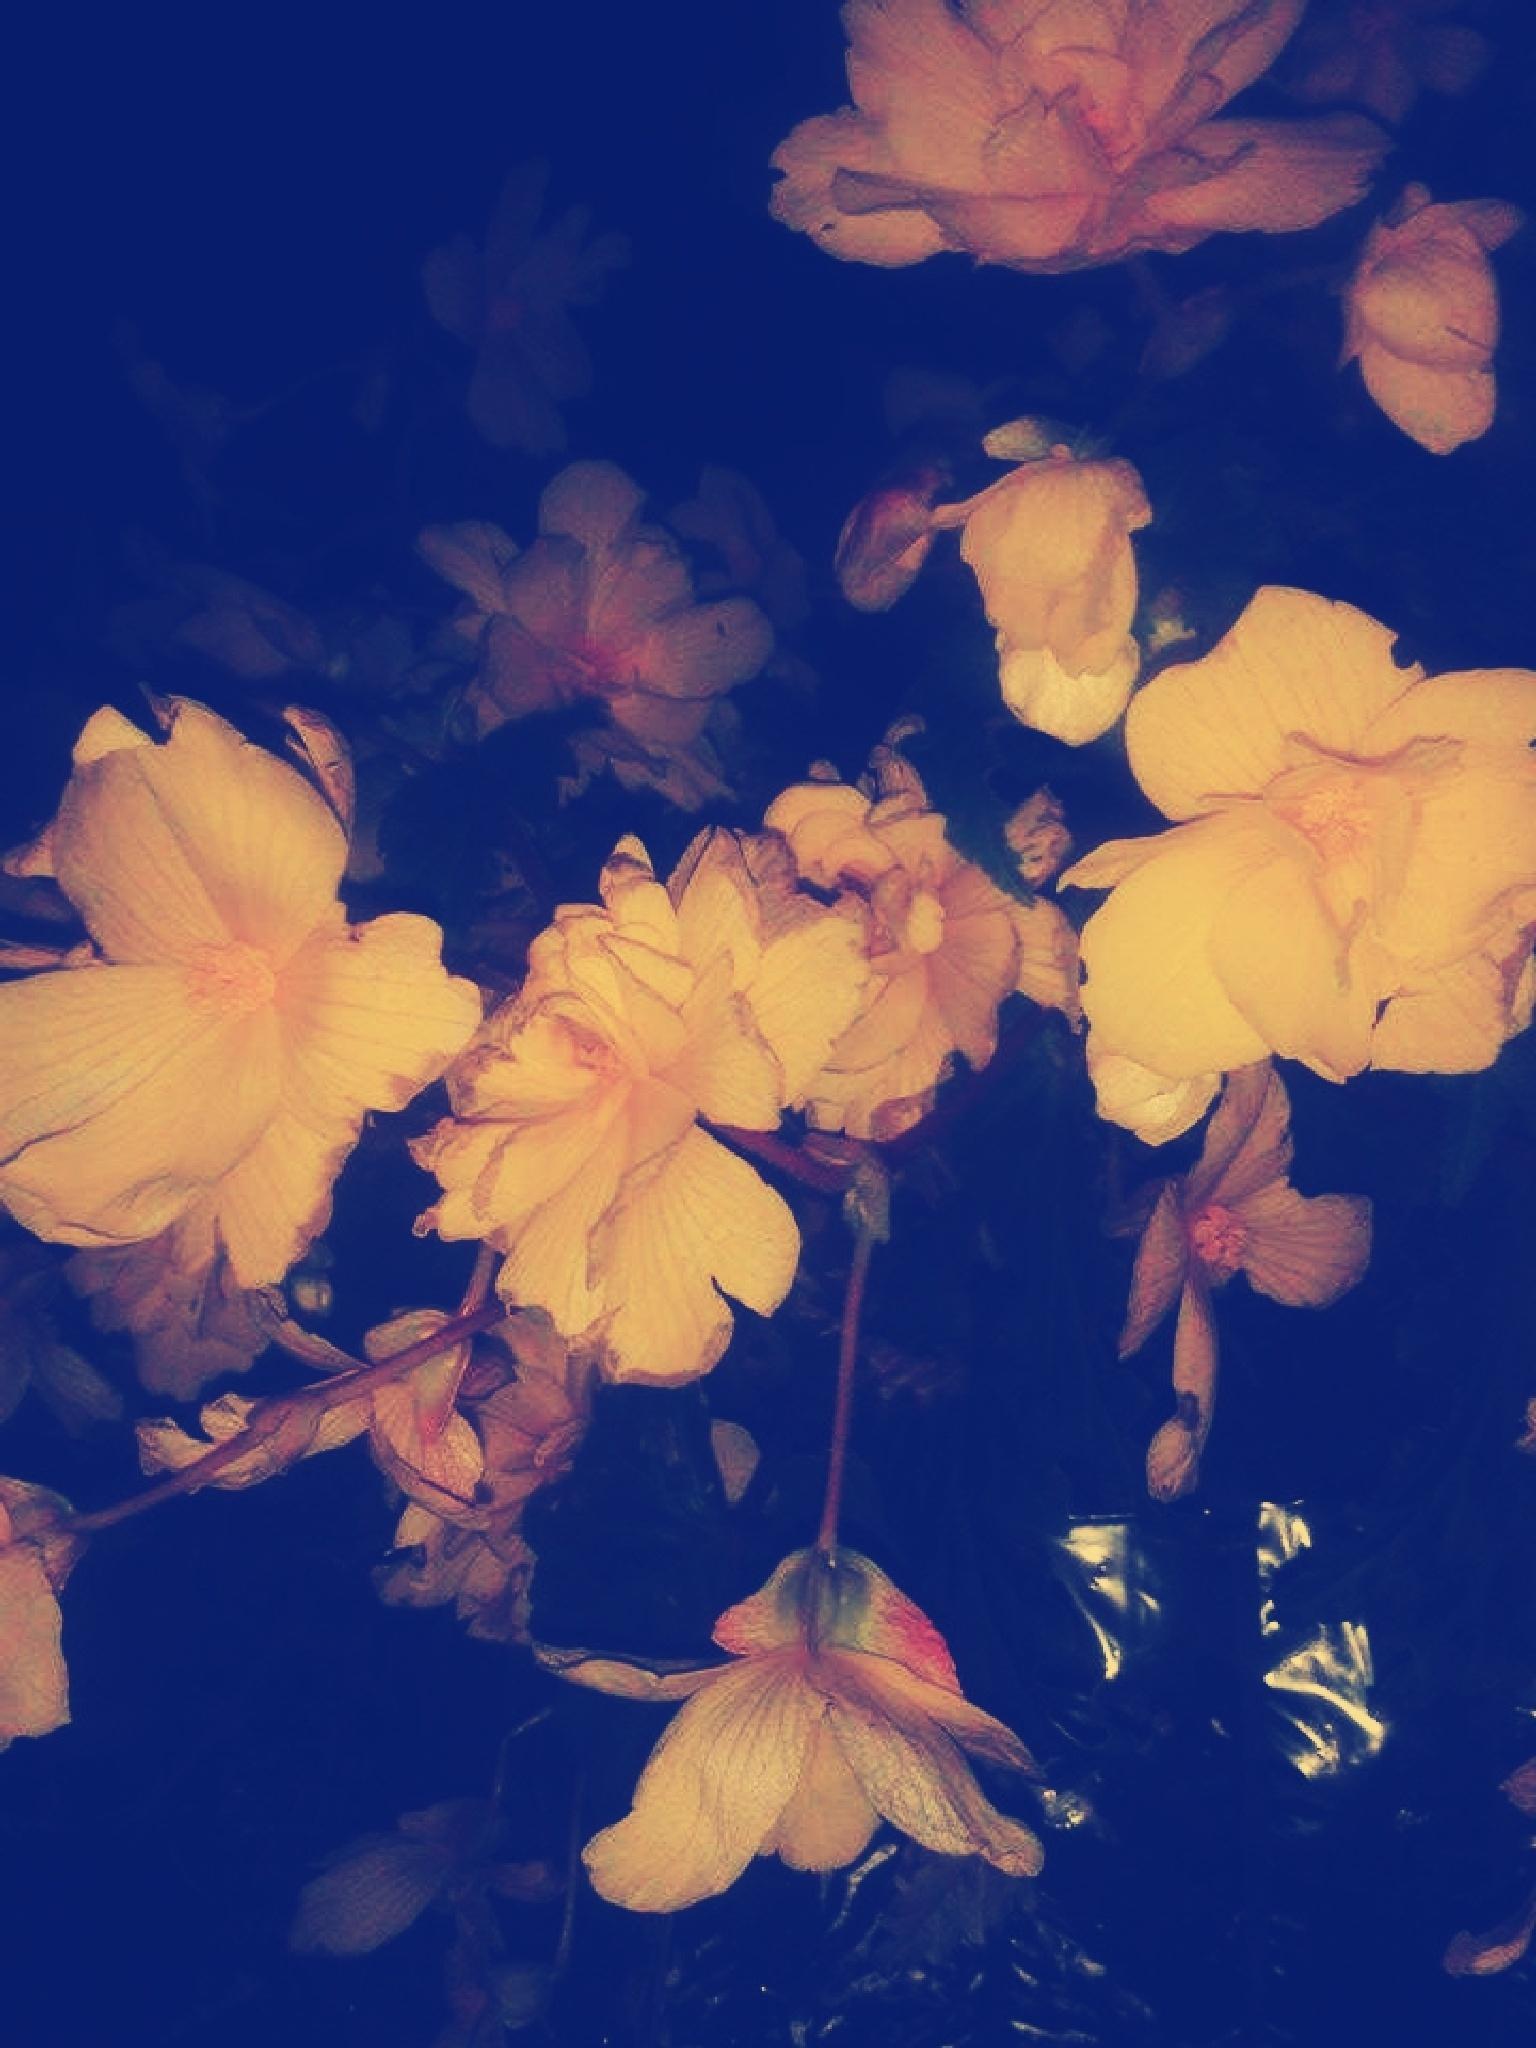 Drooping Yellows by Samantha Rose